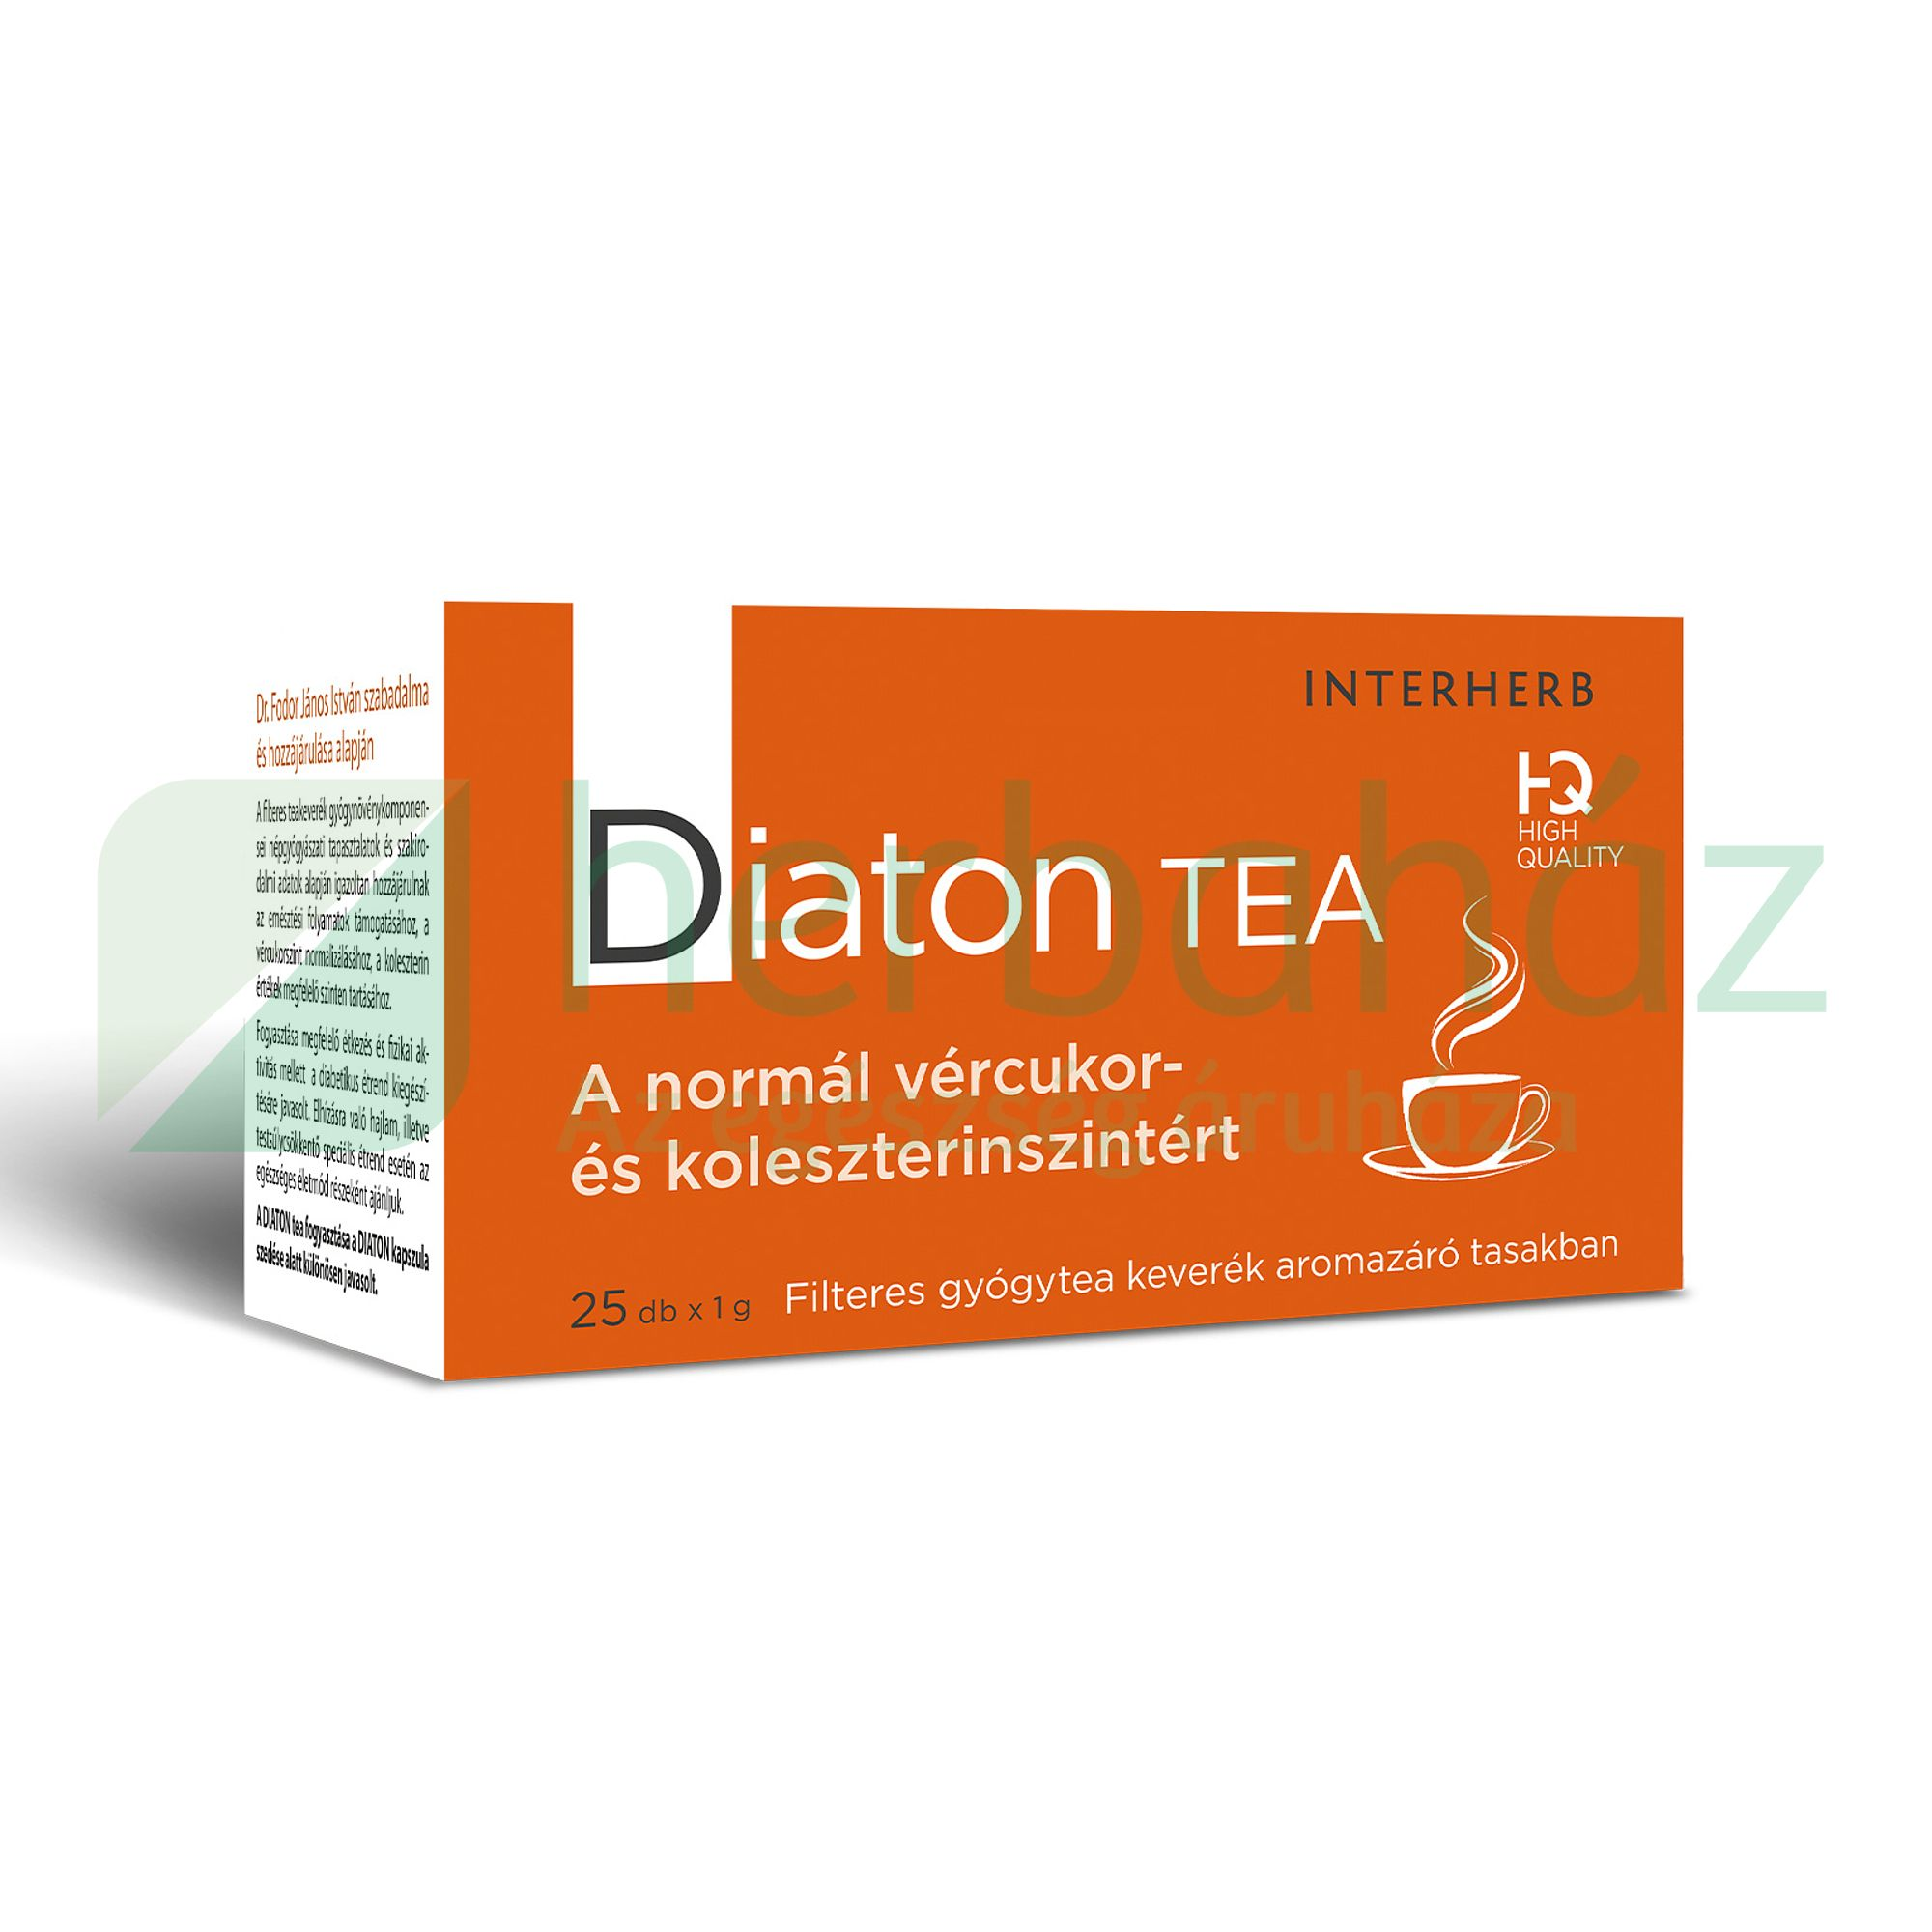 INTERHERB DIATON TEA 25DB